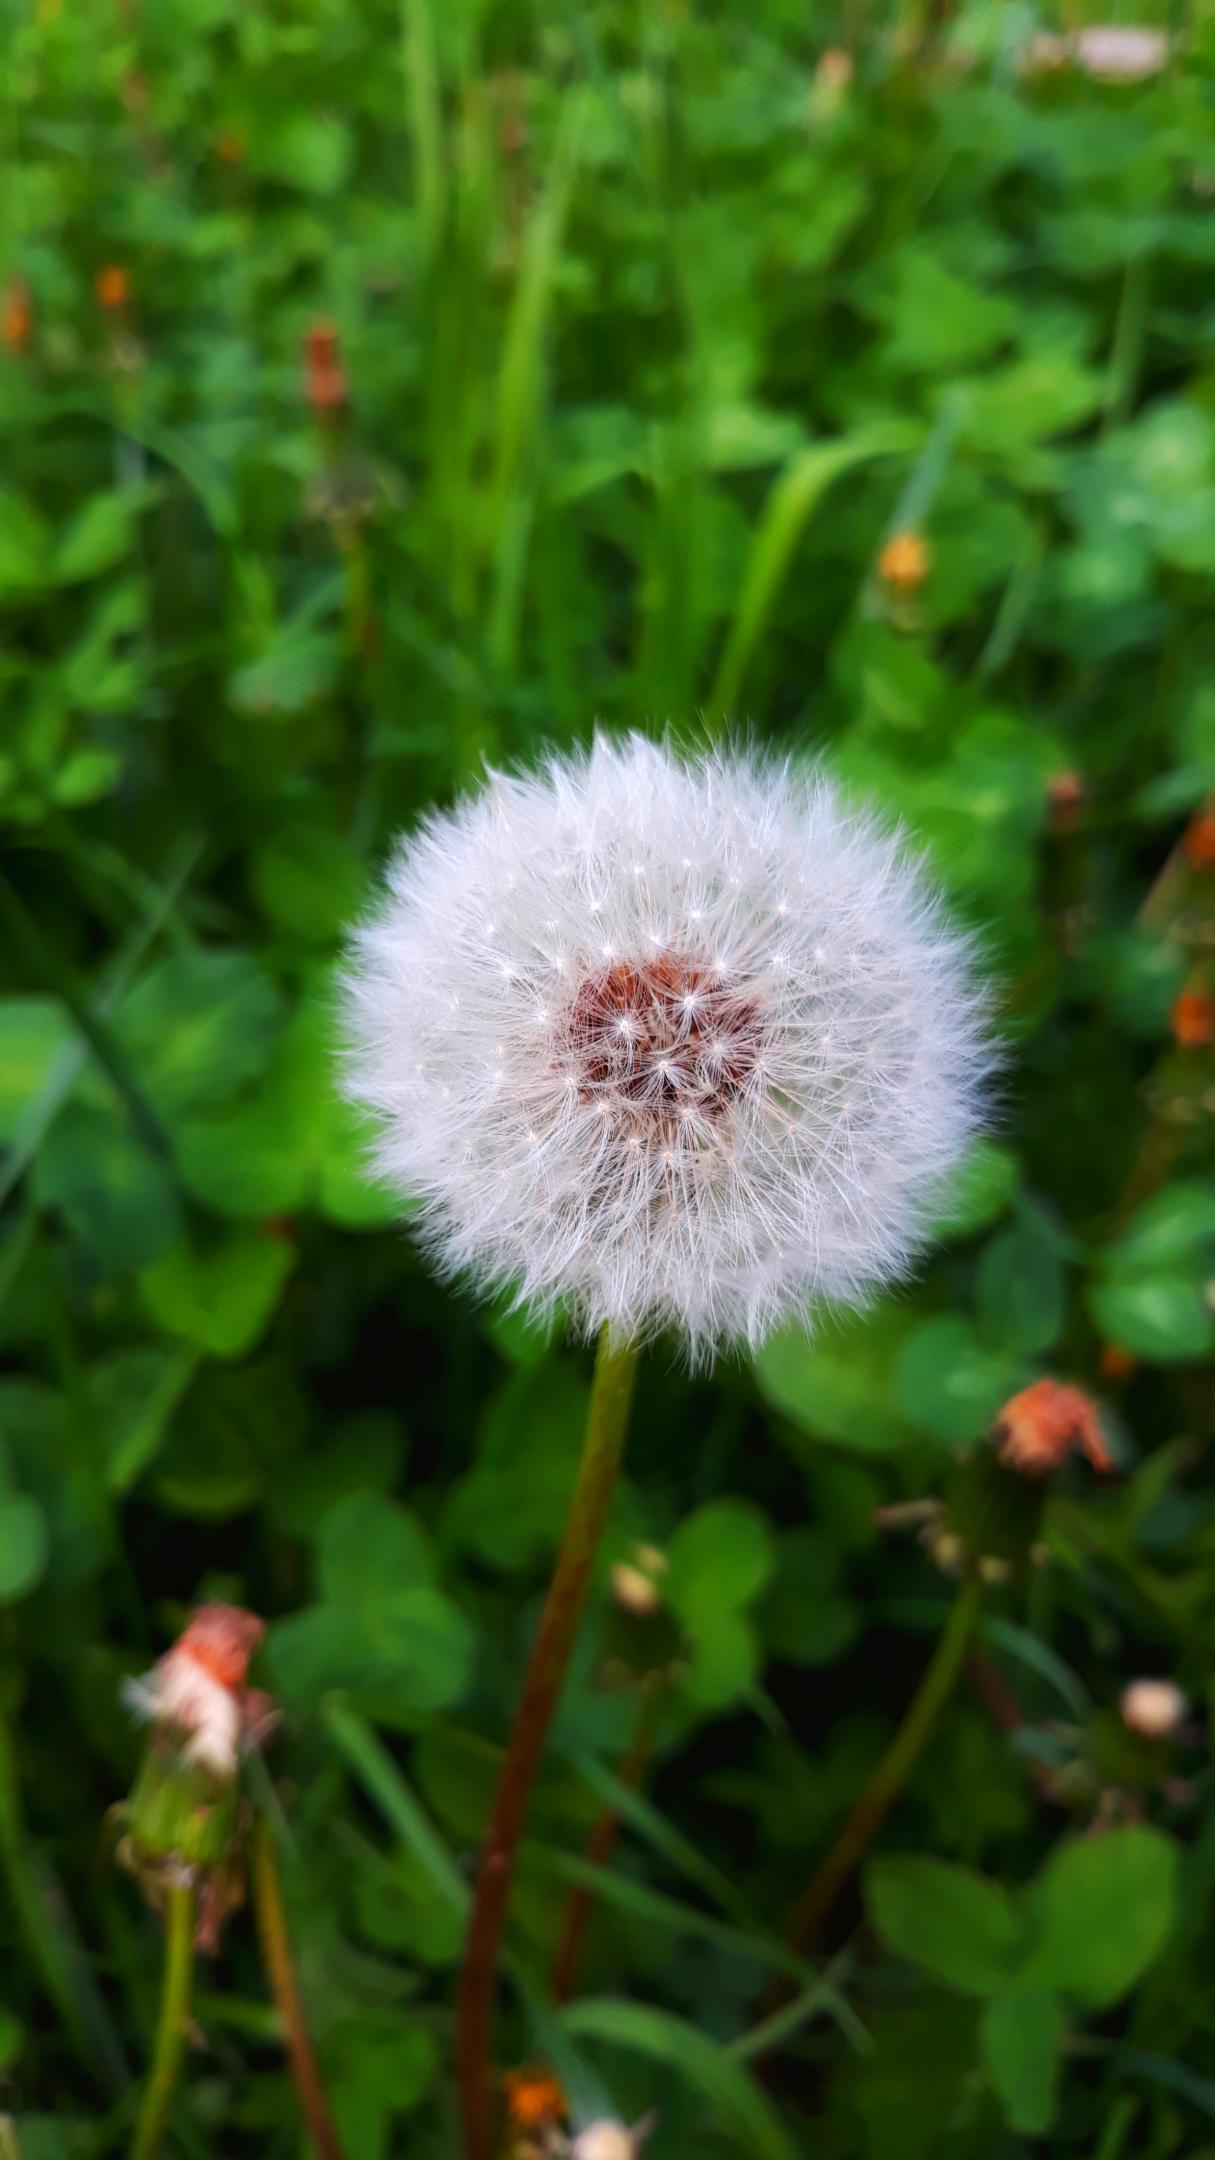 nature dandelion green background 1622253